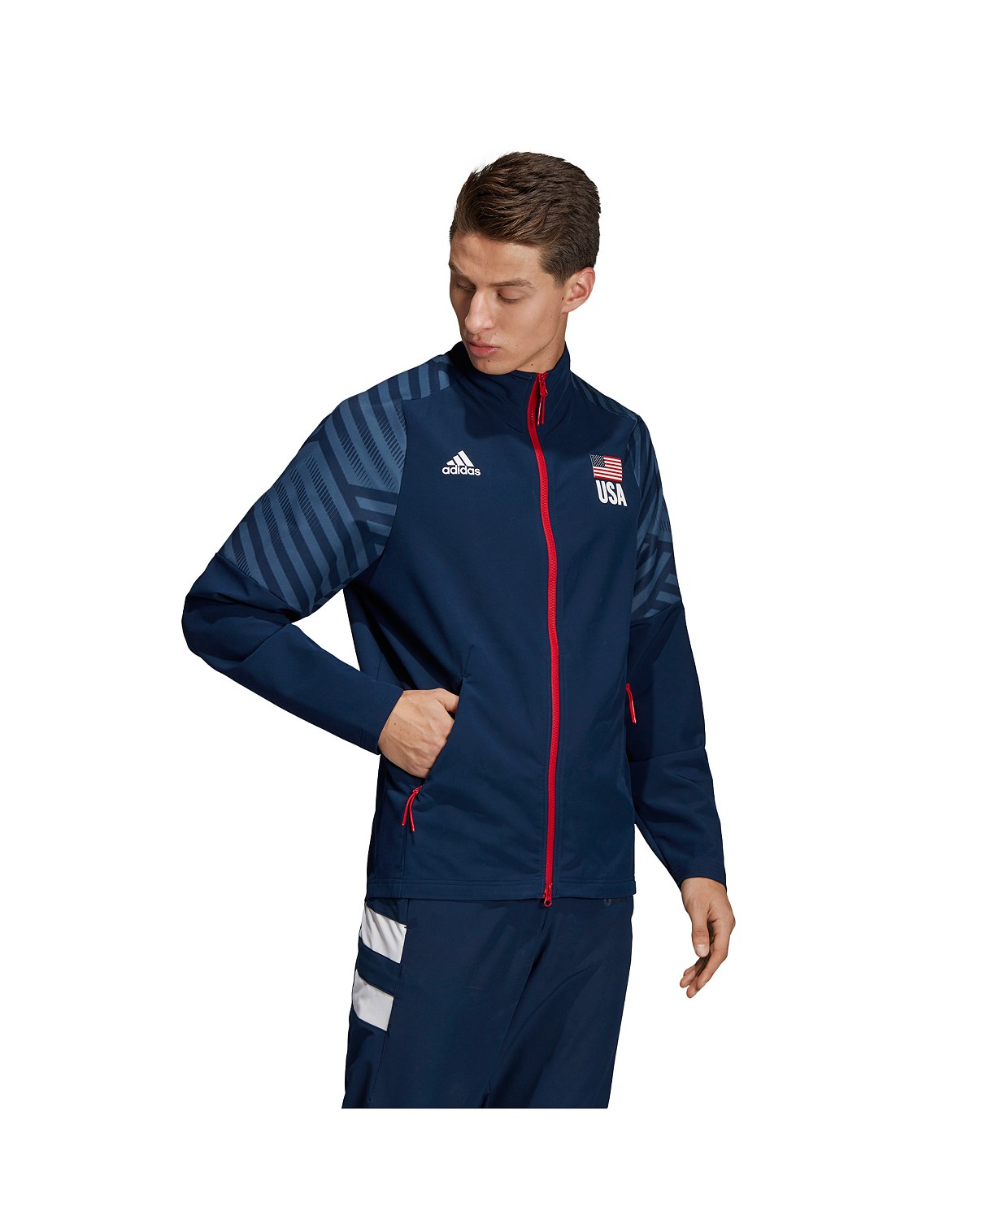 Adidas Men S Usa Volleyball Warm Up Jacket Reviews Coats Jackets Men Macy S In 2020 Jackets Volleyball Jacket Adidas Men